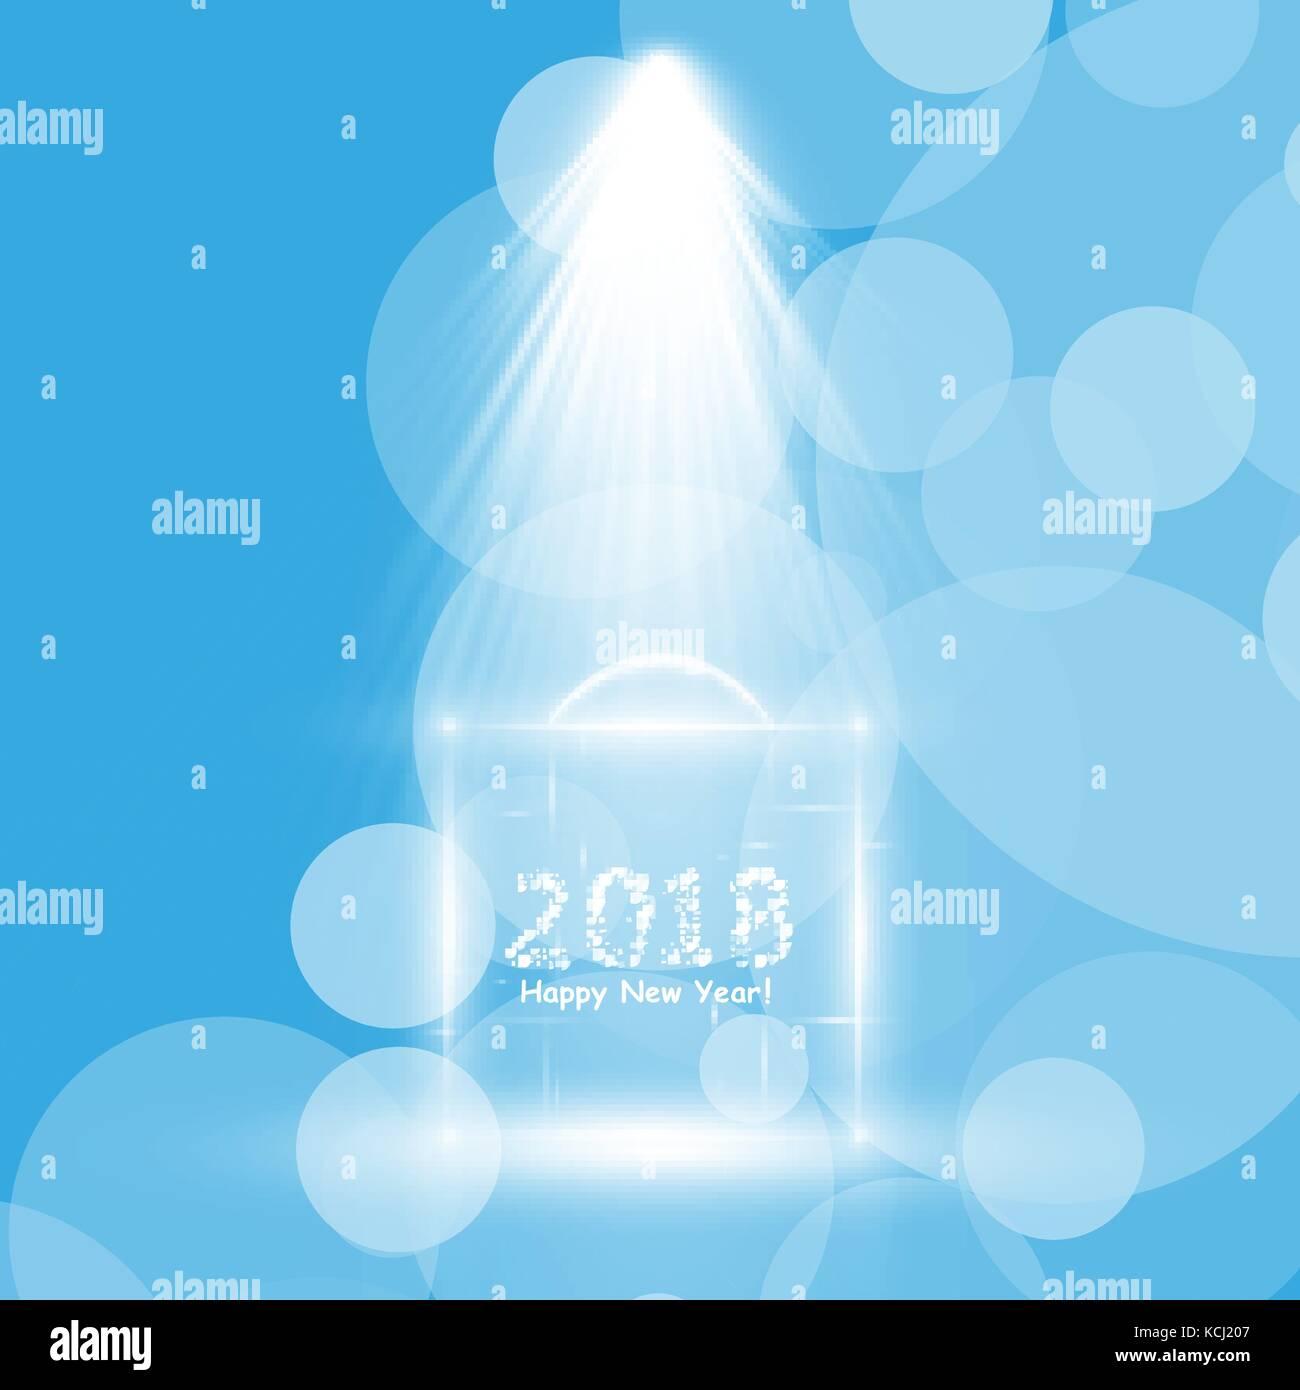 Christmas Party Poster. Frohes neues Jahr 2018 Flyer, Grußkarten ...